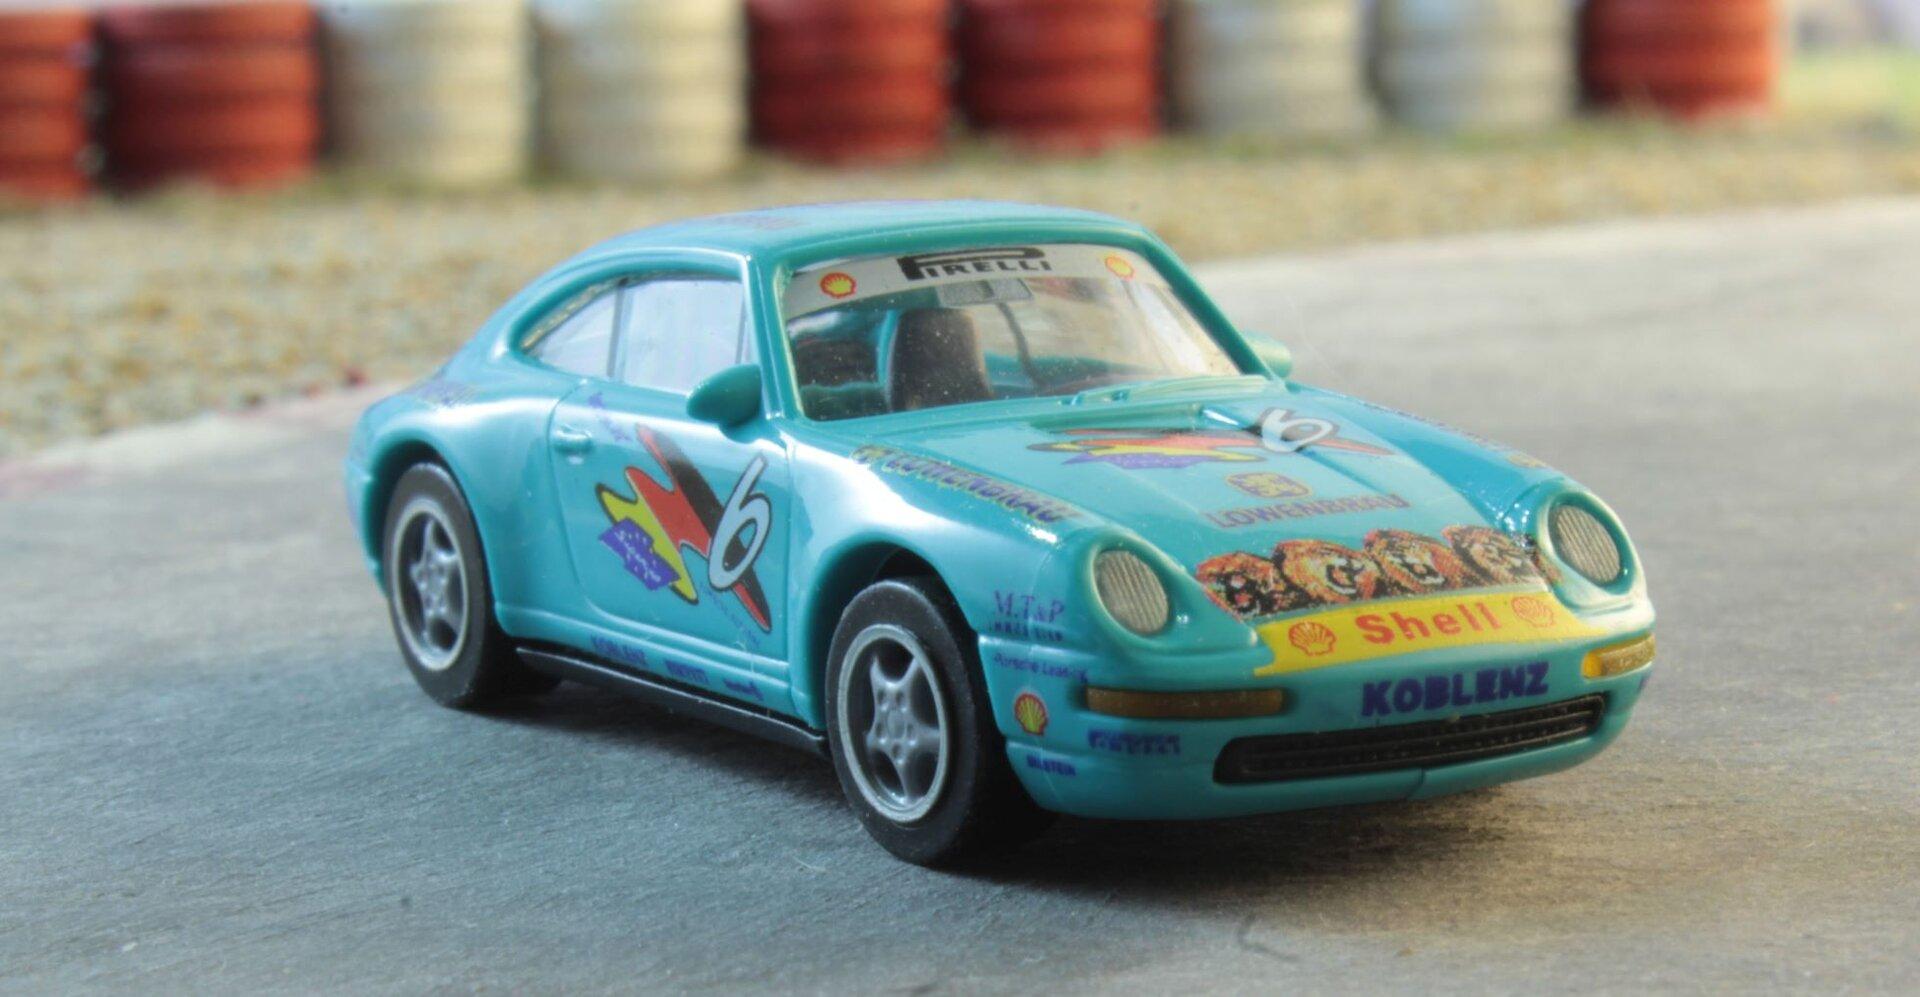 Porsche 911 Koblenz nr6 Euromodel .JPG